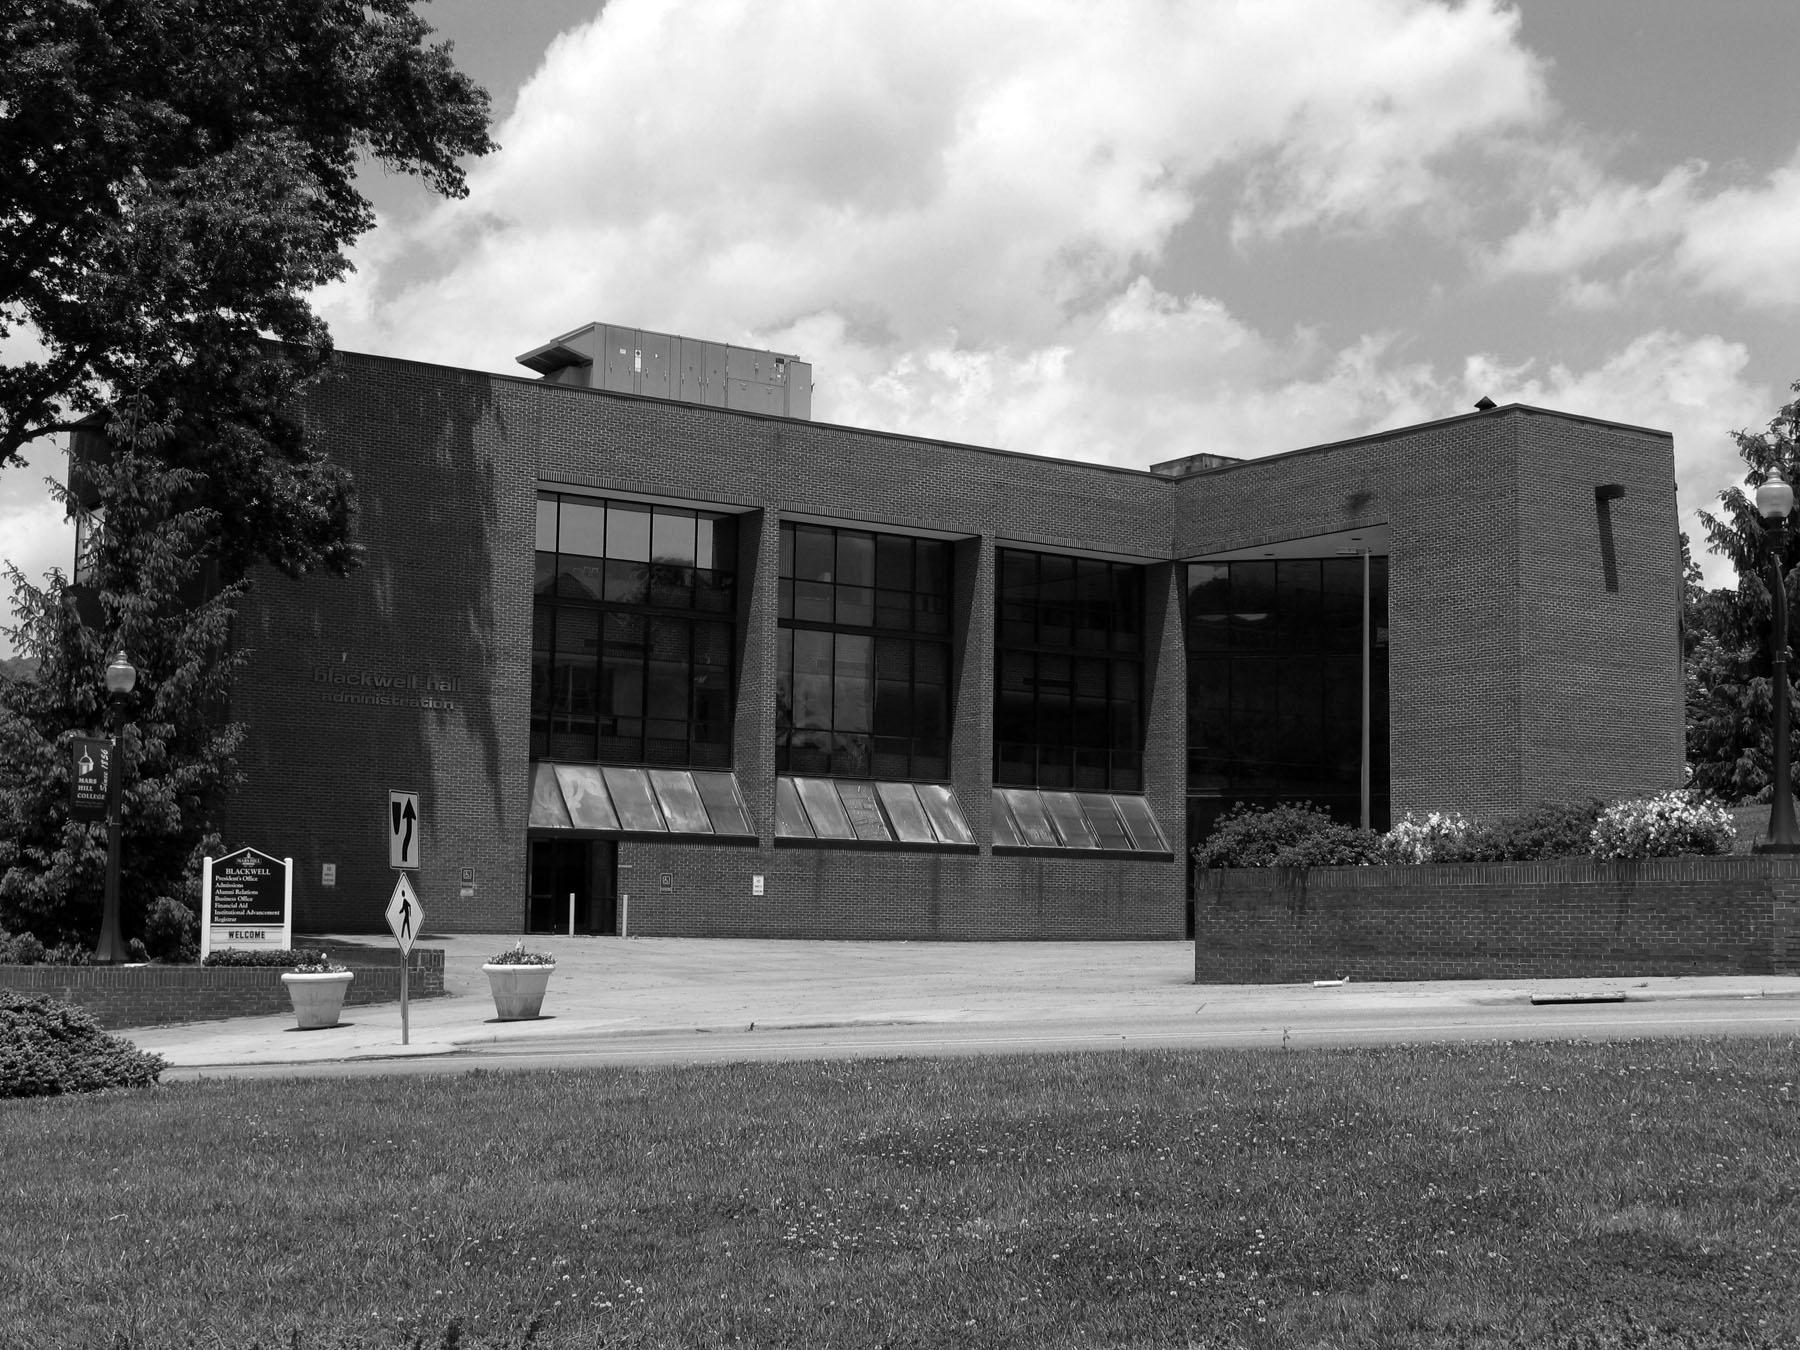 Blackwell Hall